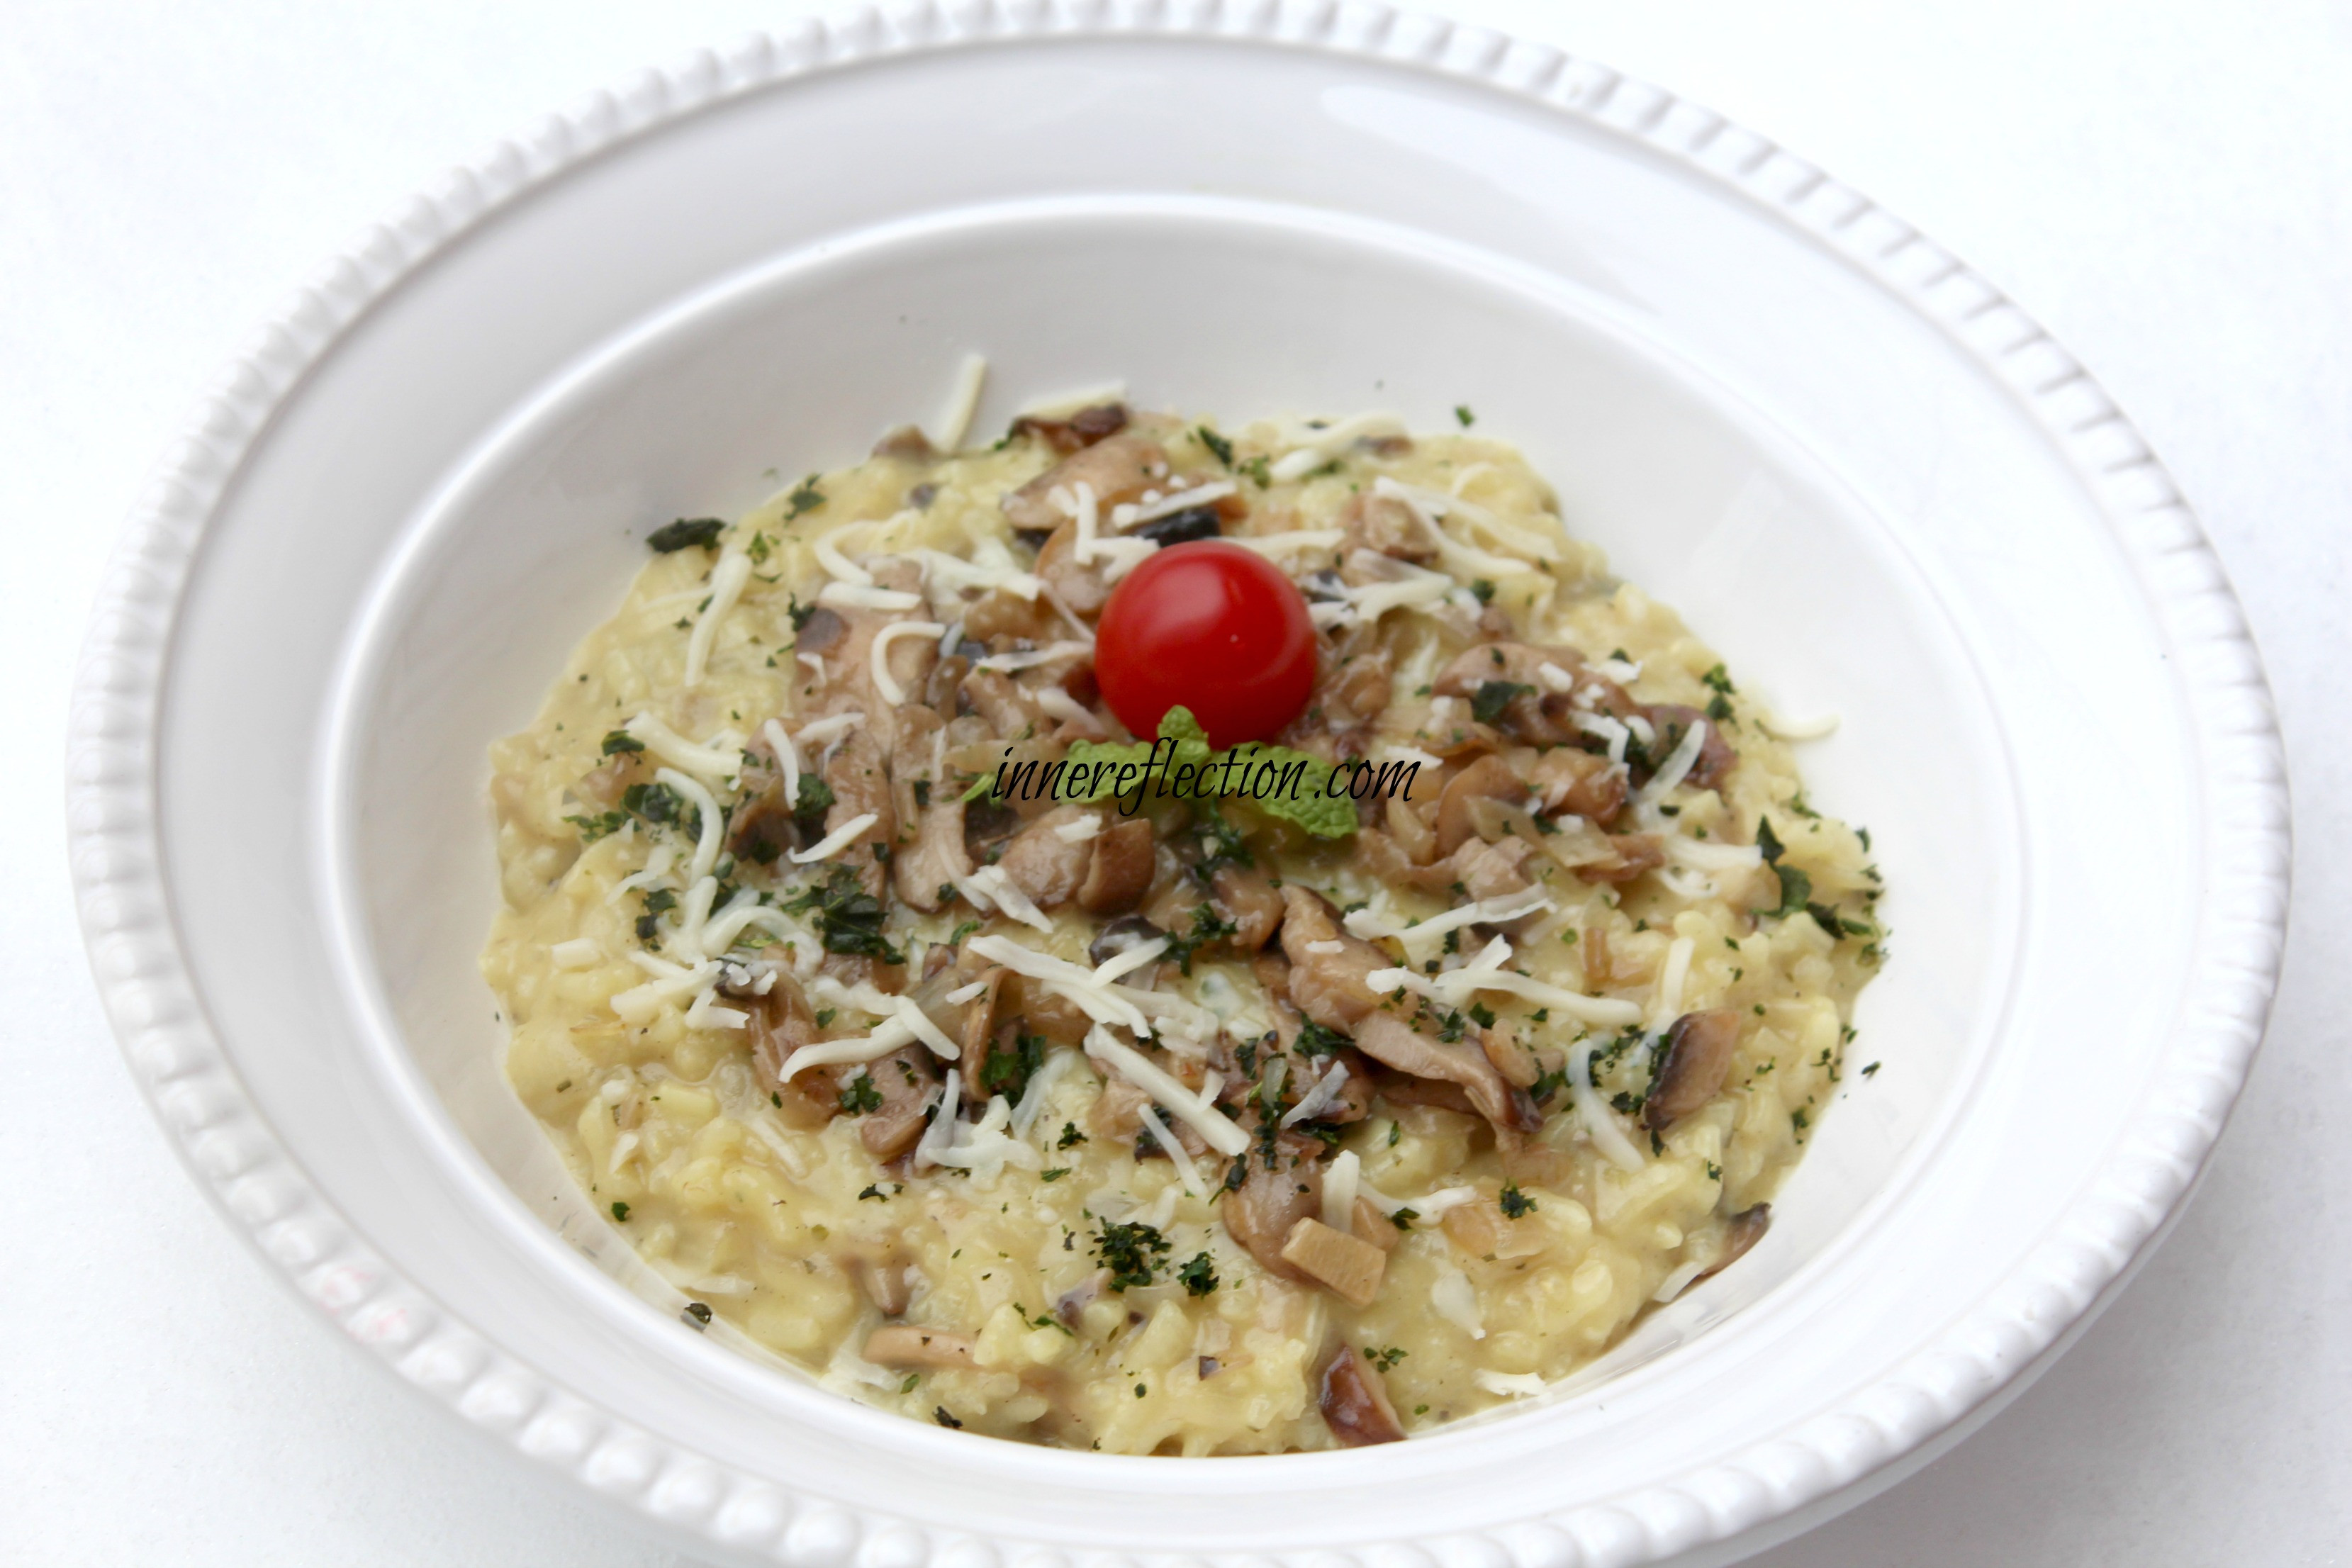 Gourmet Mushroom Risotto  Gourmet Mushroom Risotto innereflection